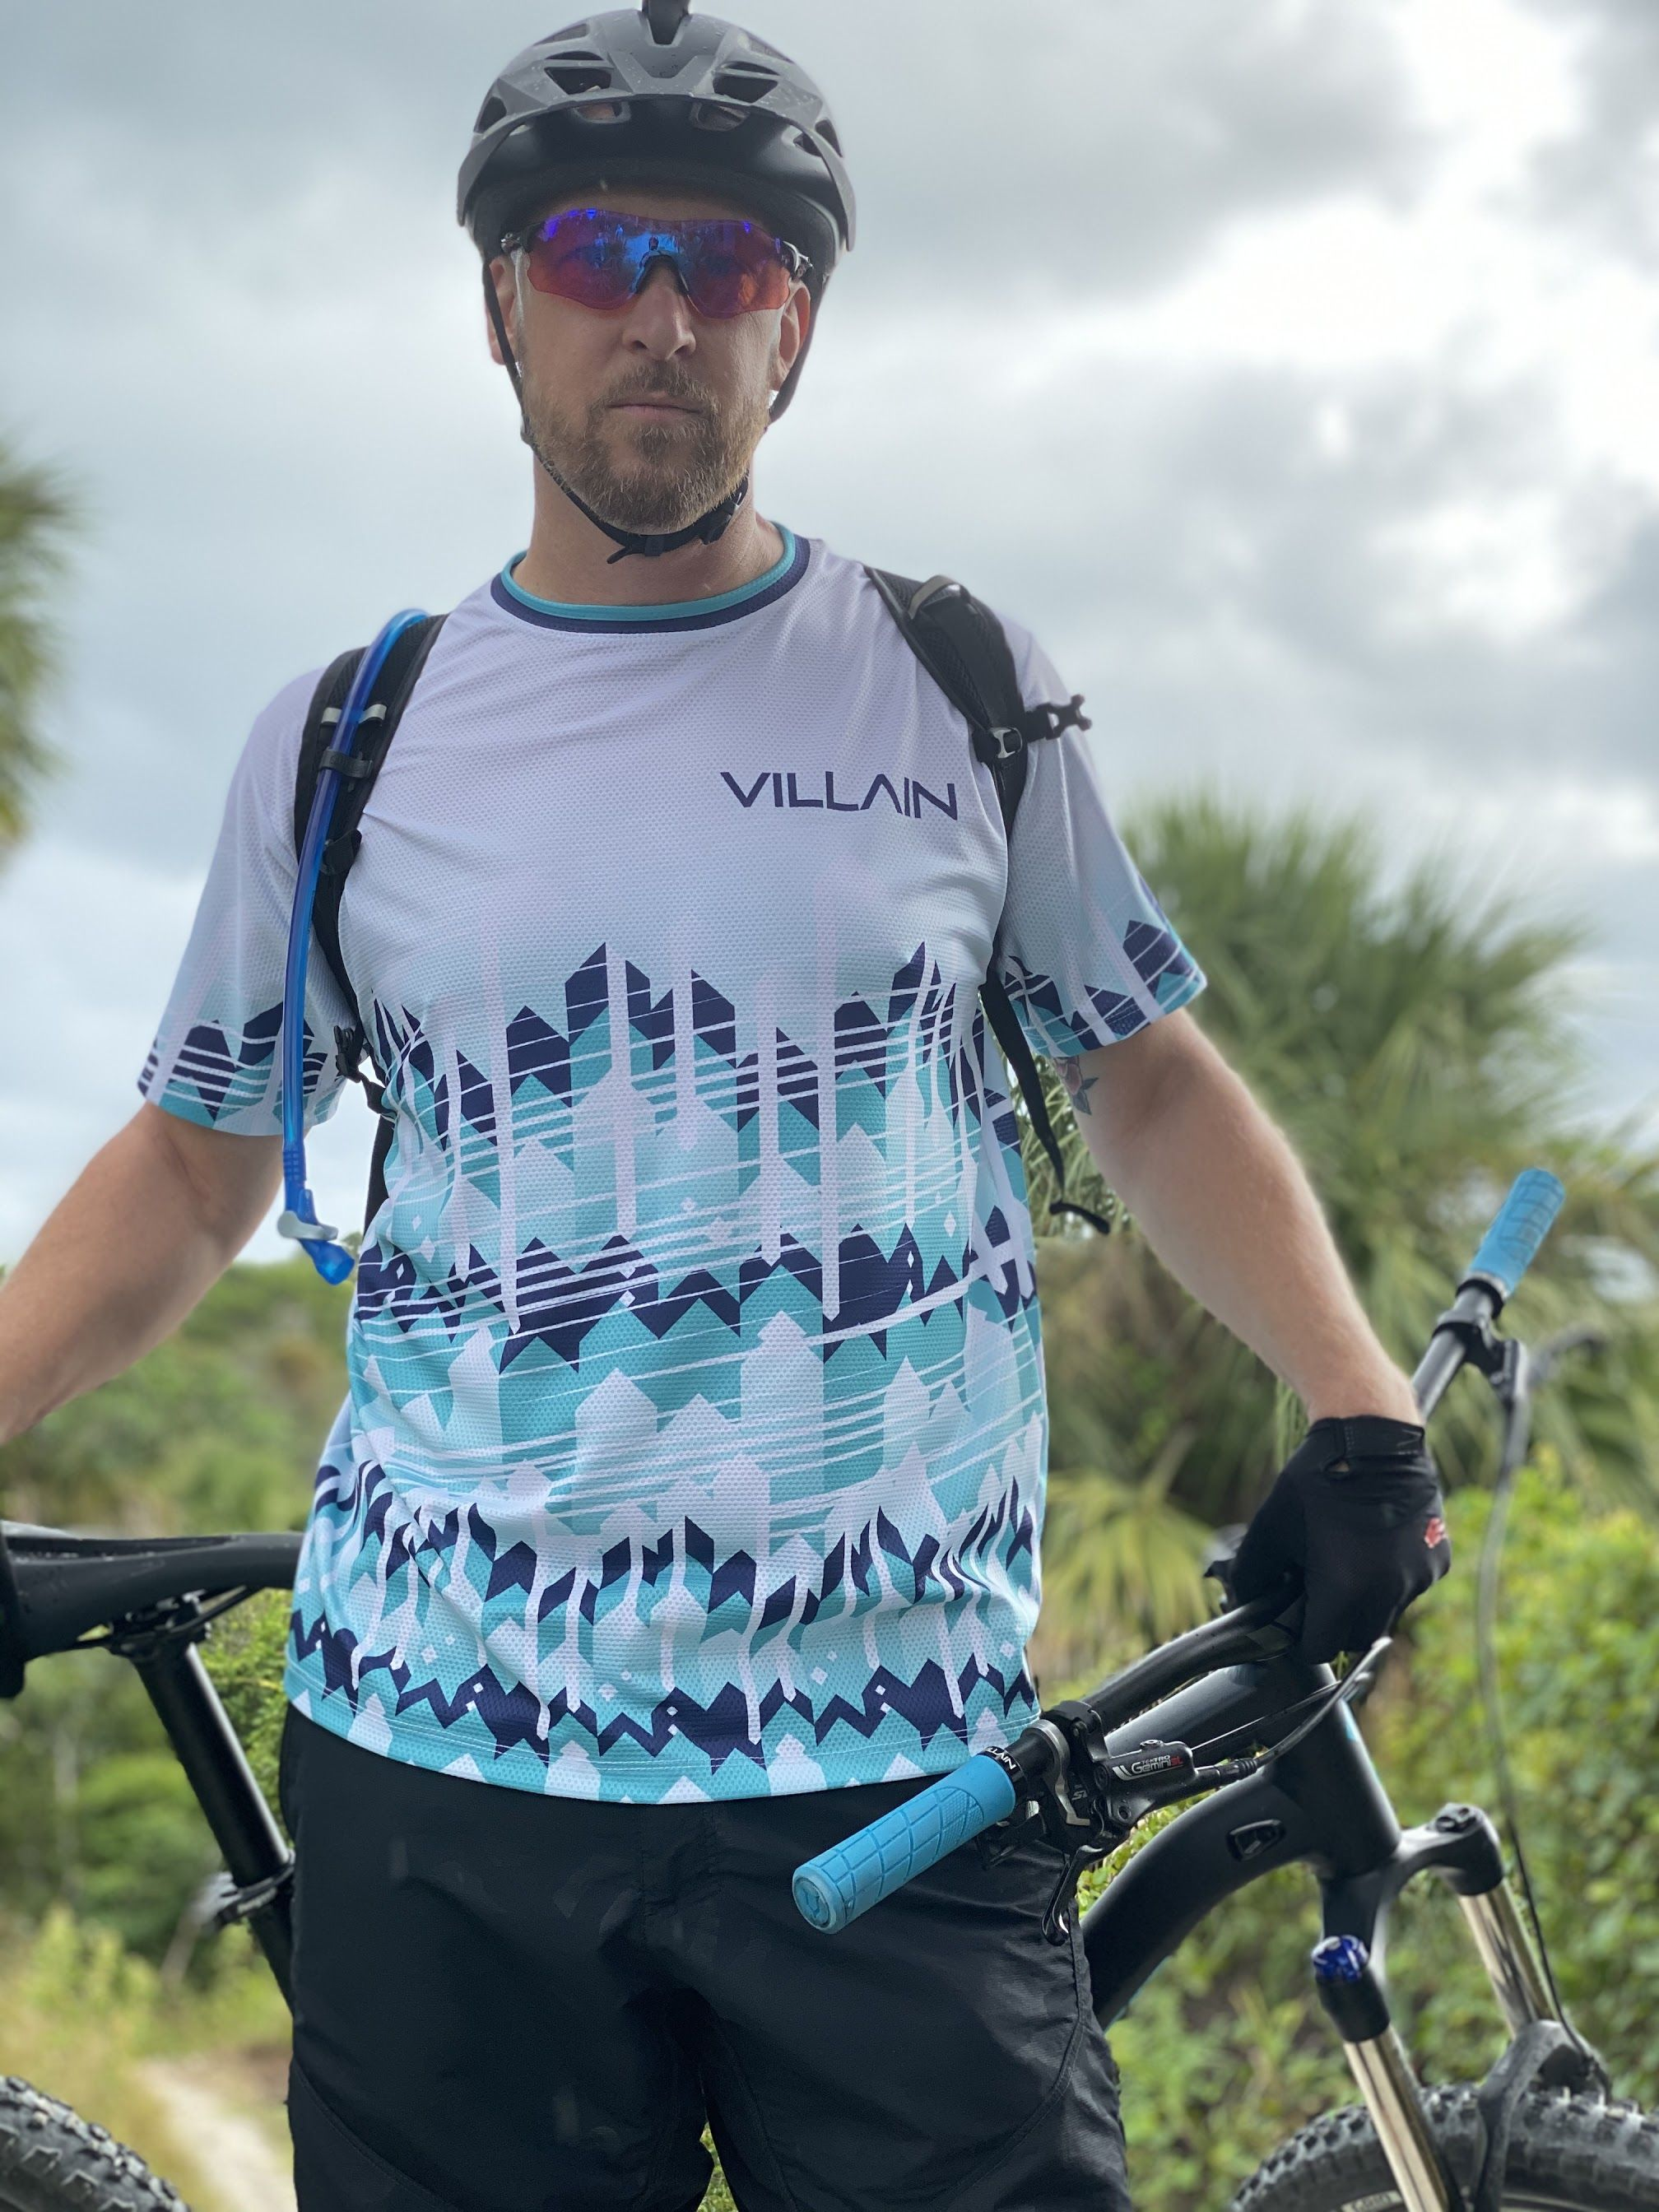 Lock-On Bike Grip VILLAIN Arrest 1st Offense Bicycle Handlebar Grips Ergonomic